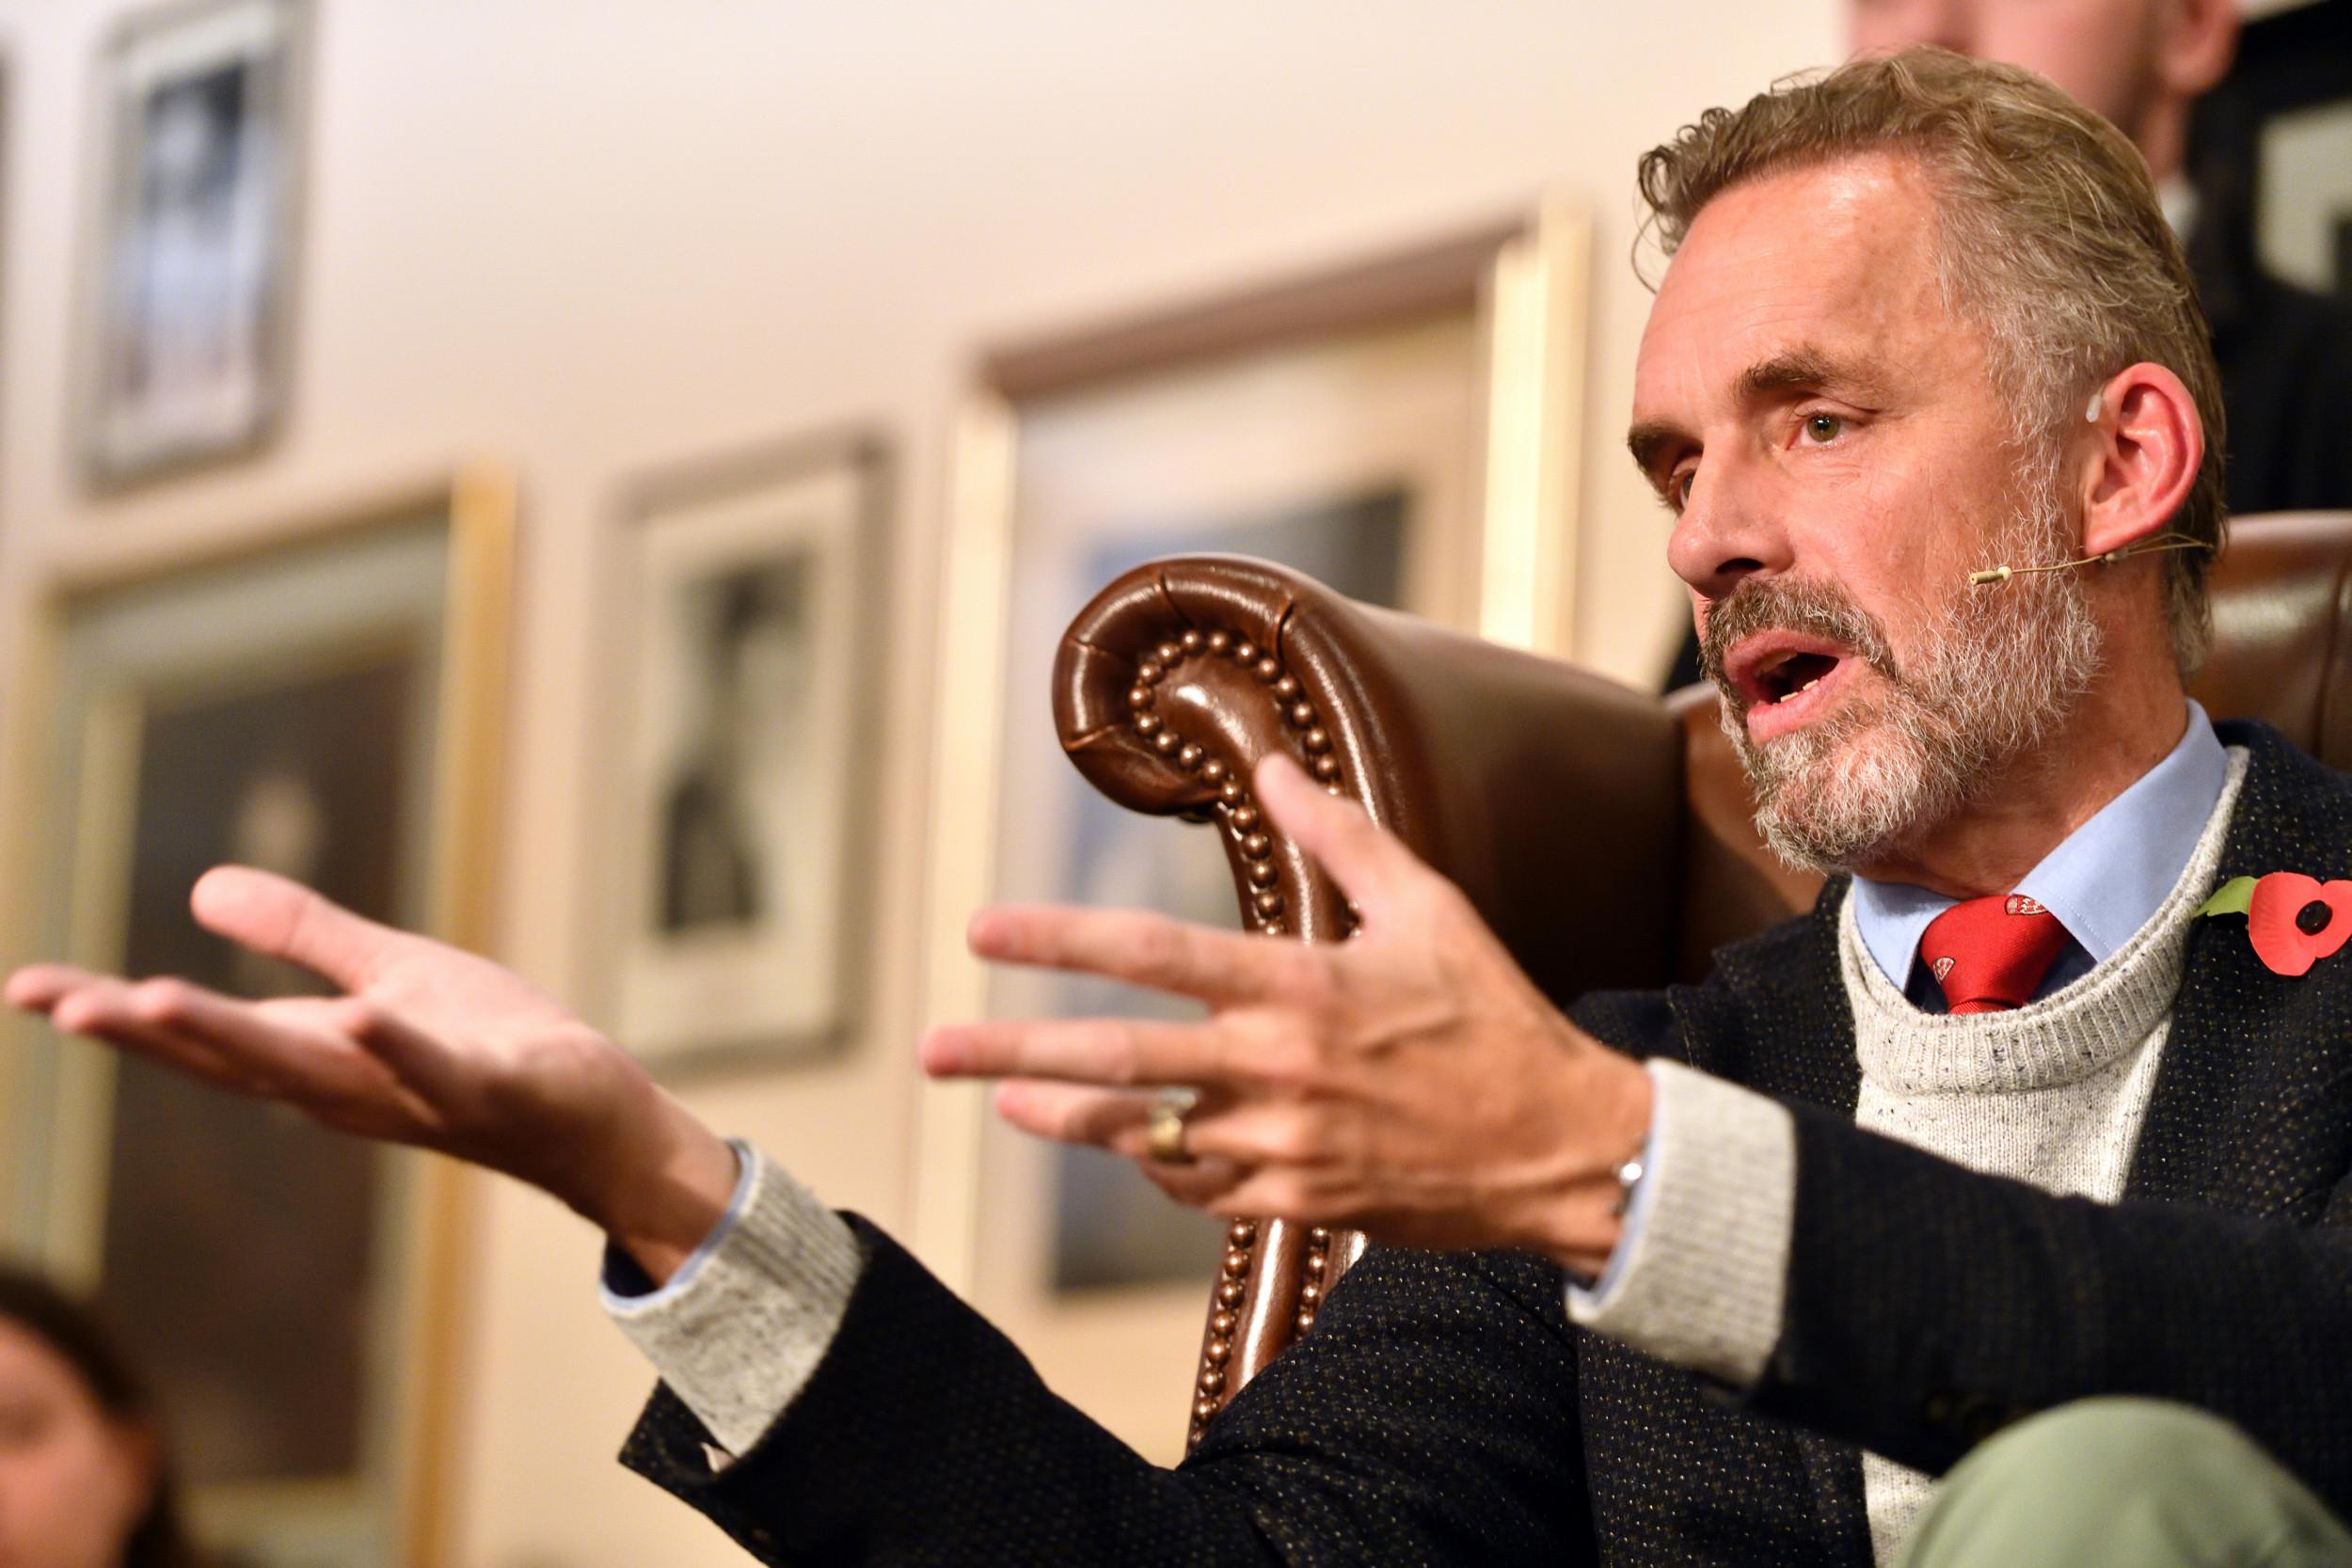 ekskluzywny asortyment szukać outlet na sprzedaż Jordan Peterson Pulls Out of Politicon 2019, Citing Ongoing ...